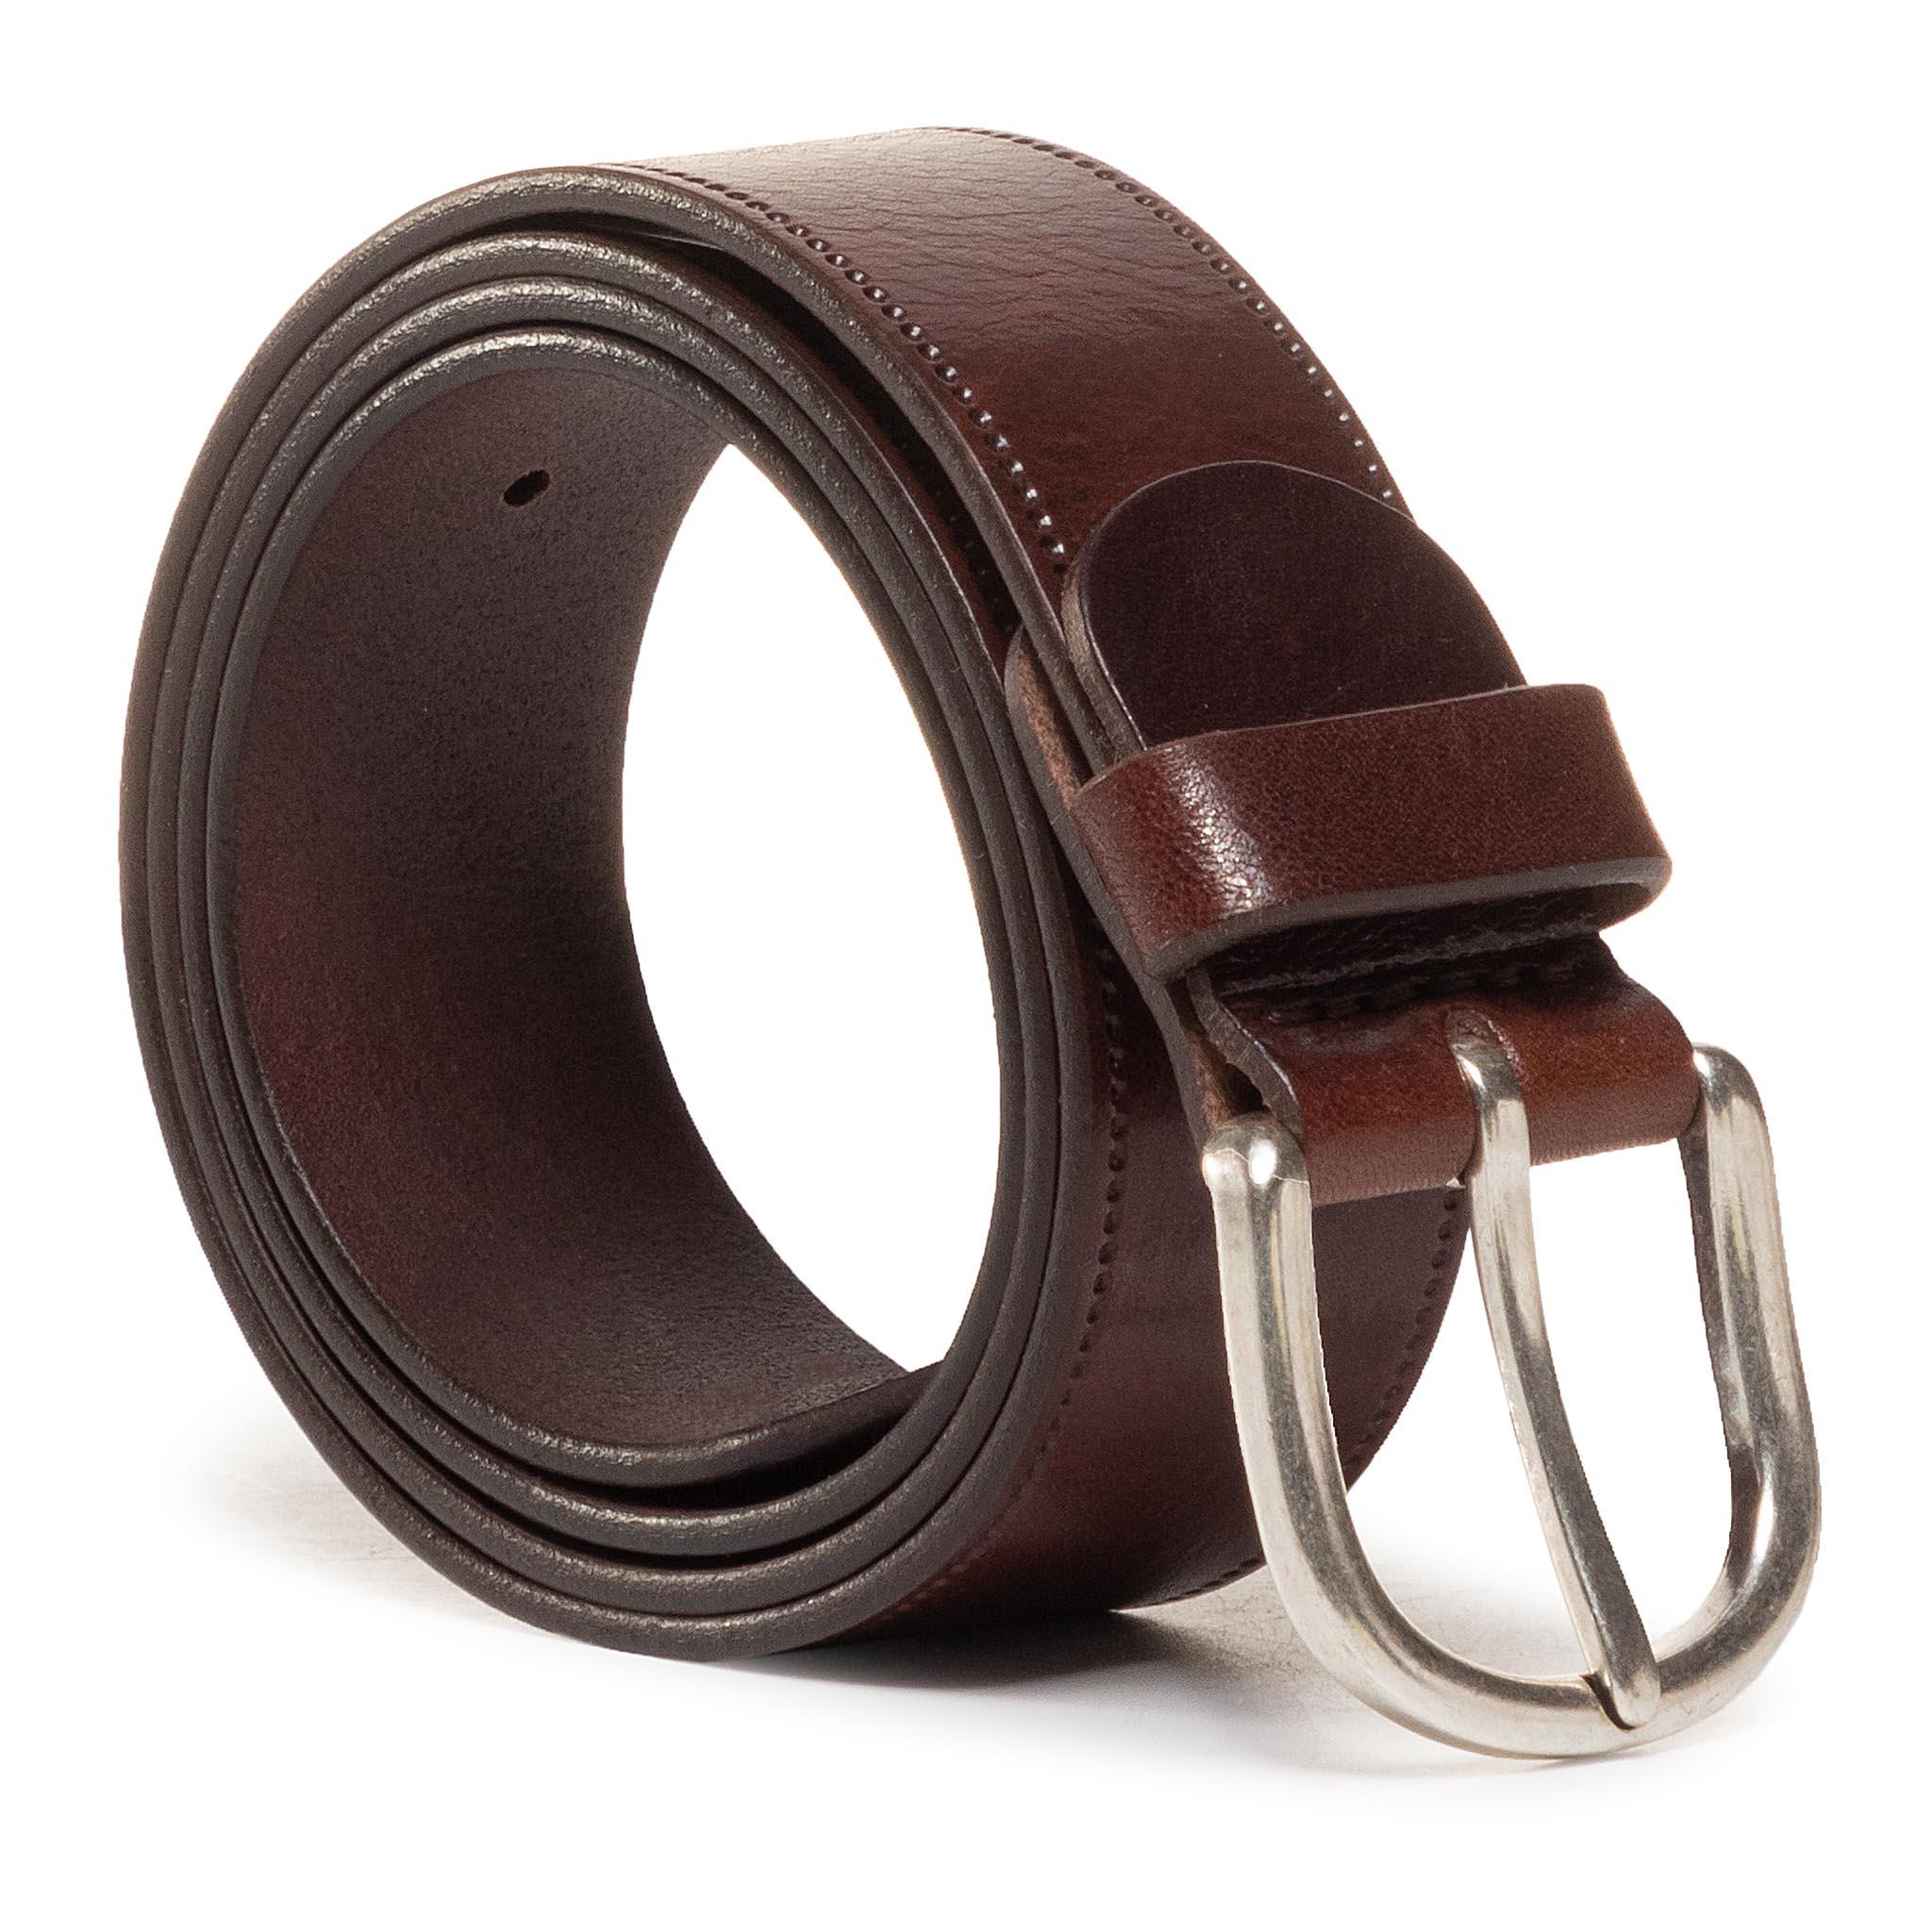 Image of Cintura da uomo LEE - Belt LR015024 Dark Brown